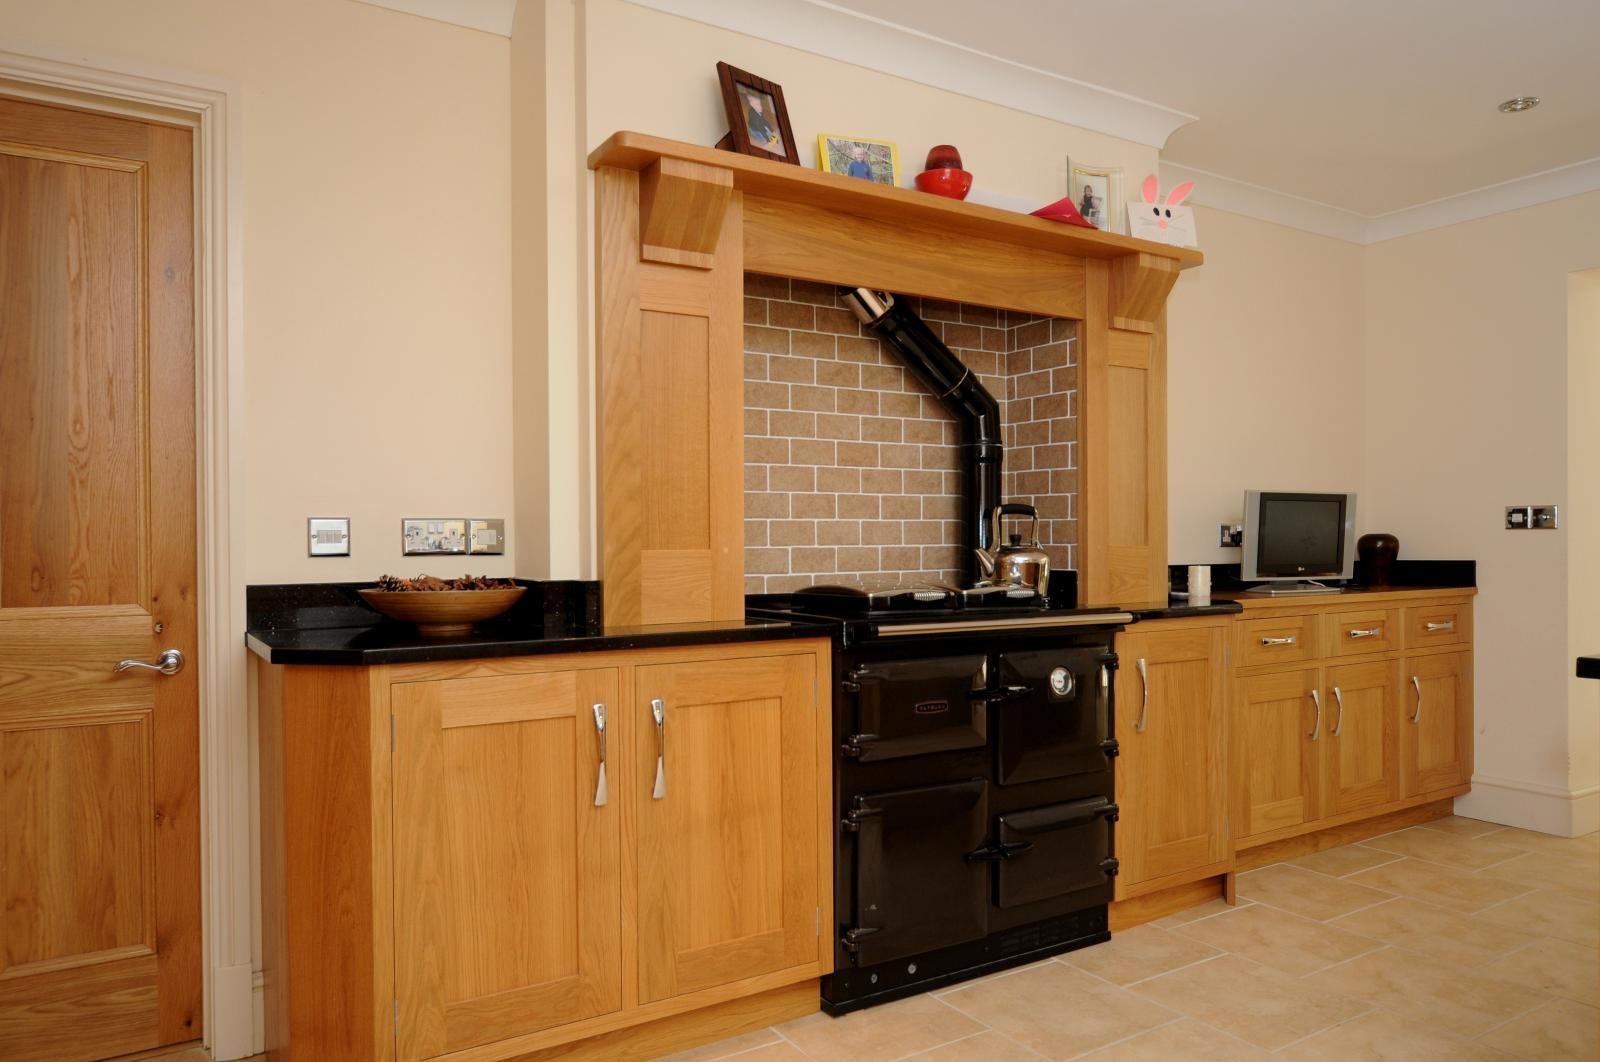 Oak Shaker Kitchen St Davids  Mark Stones Welsh Kitchens  bespoke kitchens and furnuture made